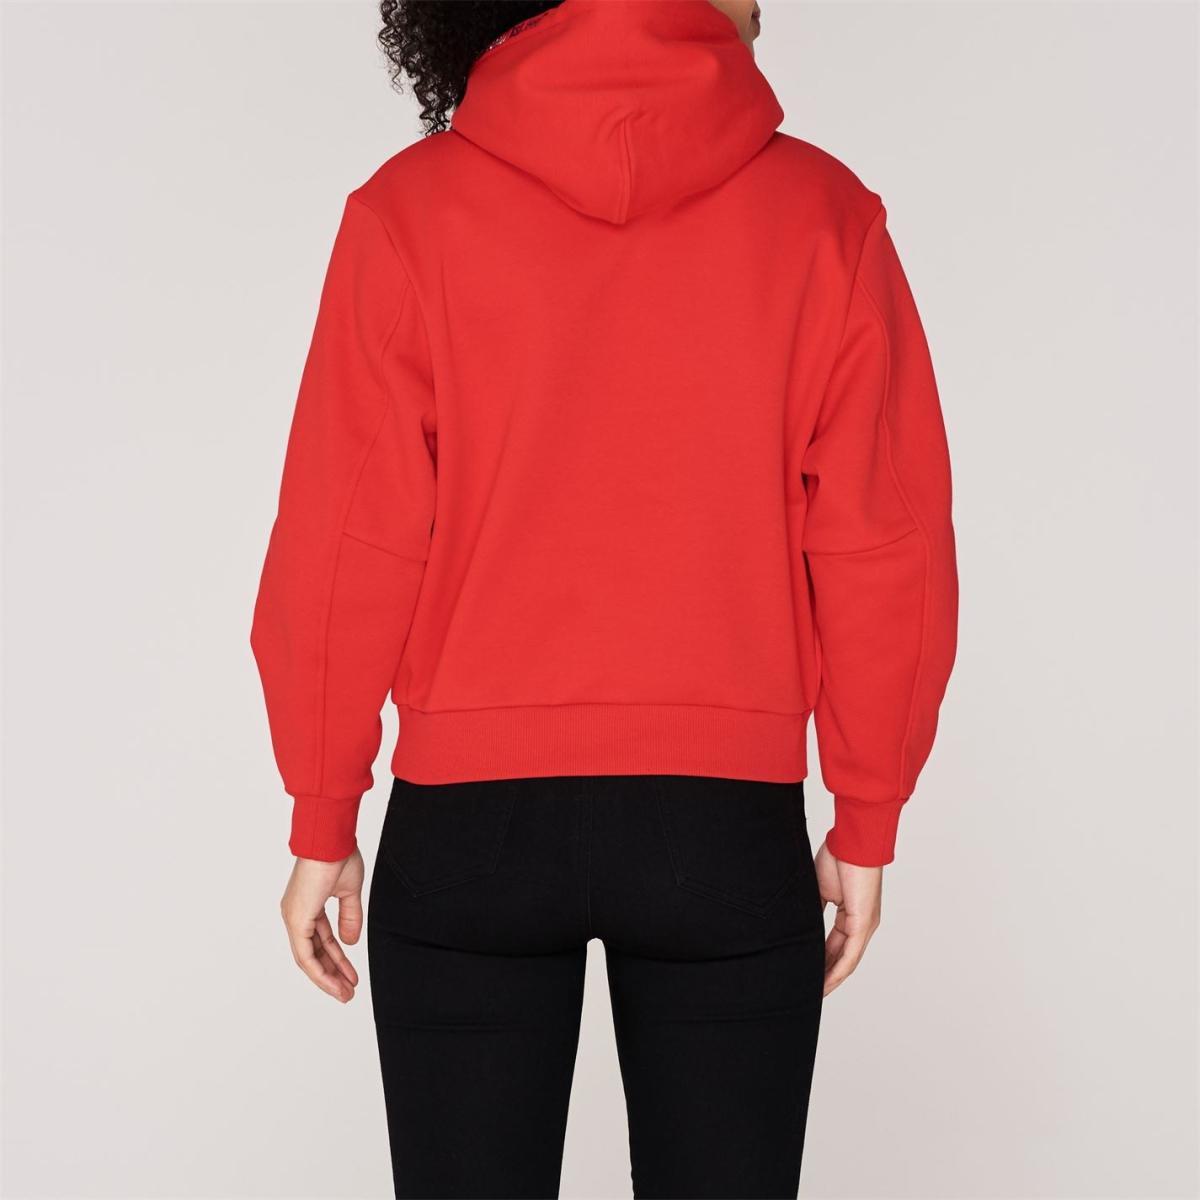 Lonsdale Kapuzenjacke Jacke Kapuzenpullover Damen Sweatshirt Pullover 0760